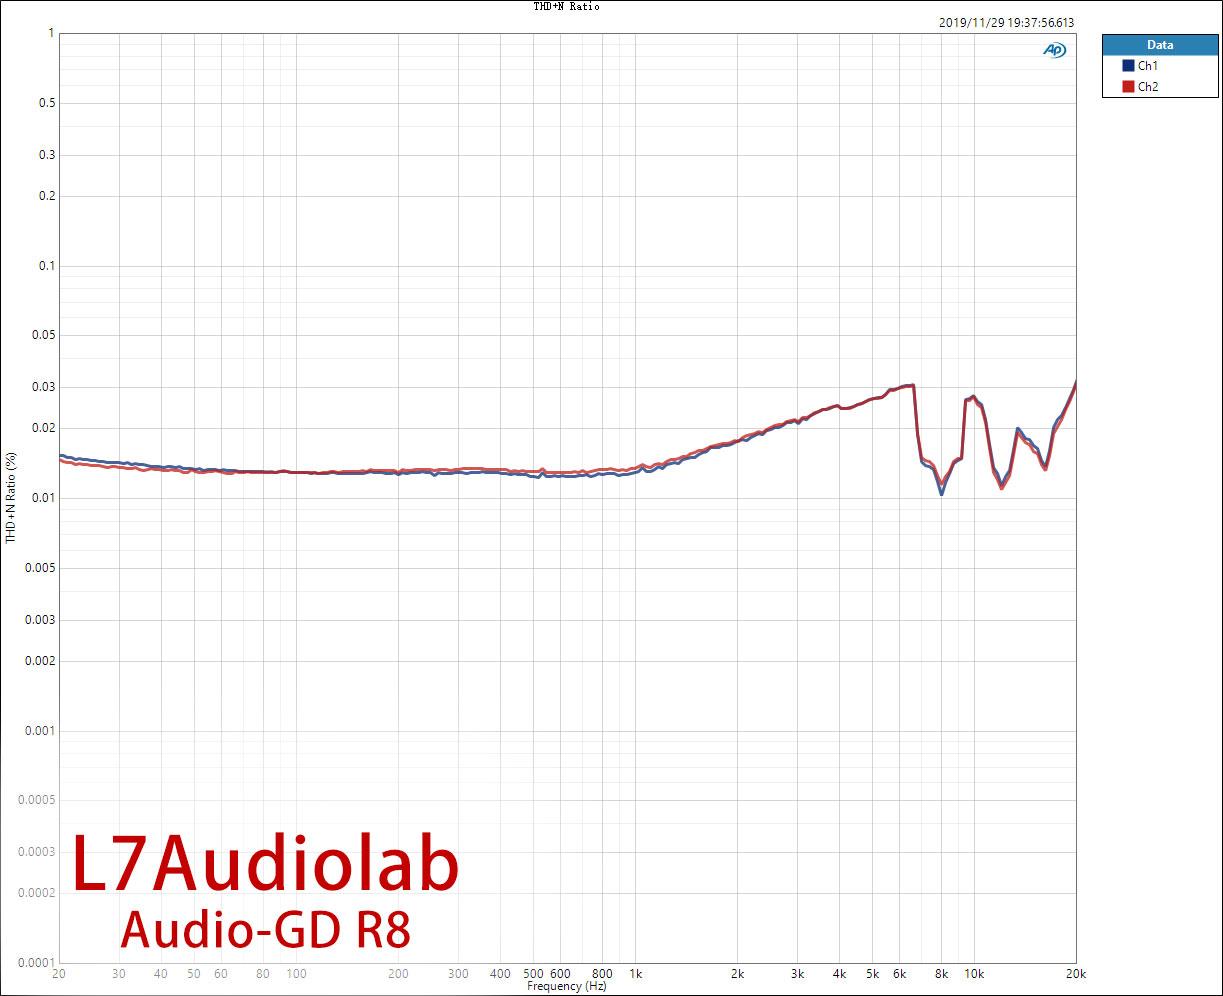 THD+N-Ratio-Freq.jpg